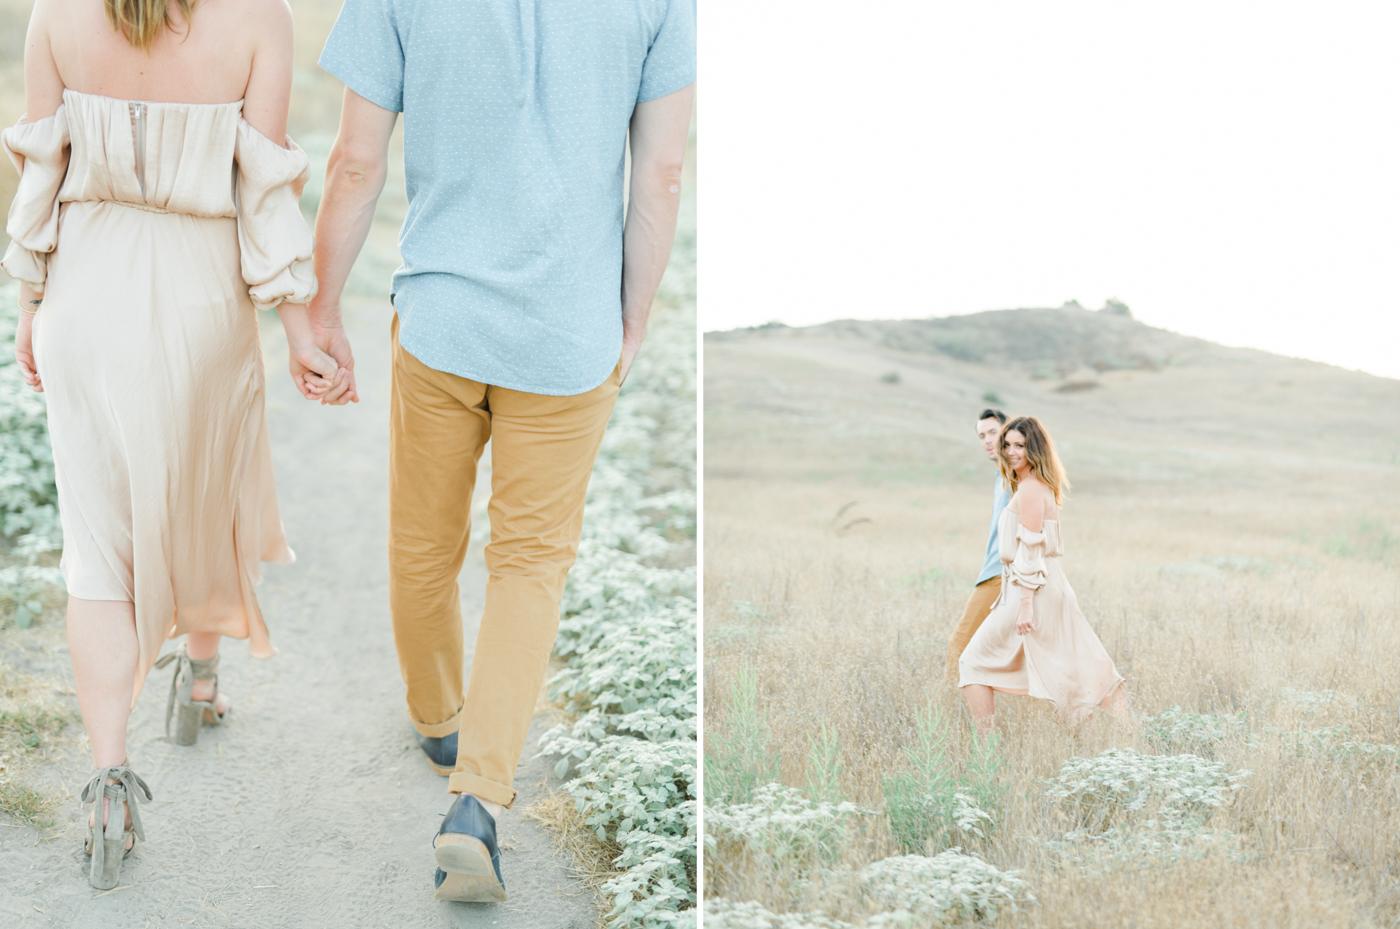 Malibu_Creek_State_Park_Romantic_Engagement_Session_C&J_romantic-29.jpg